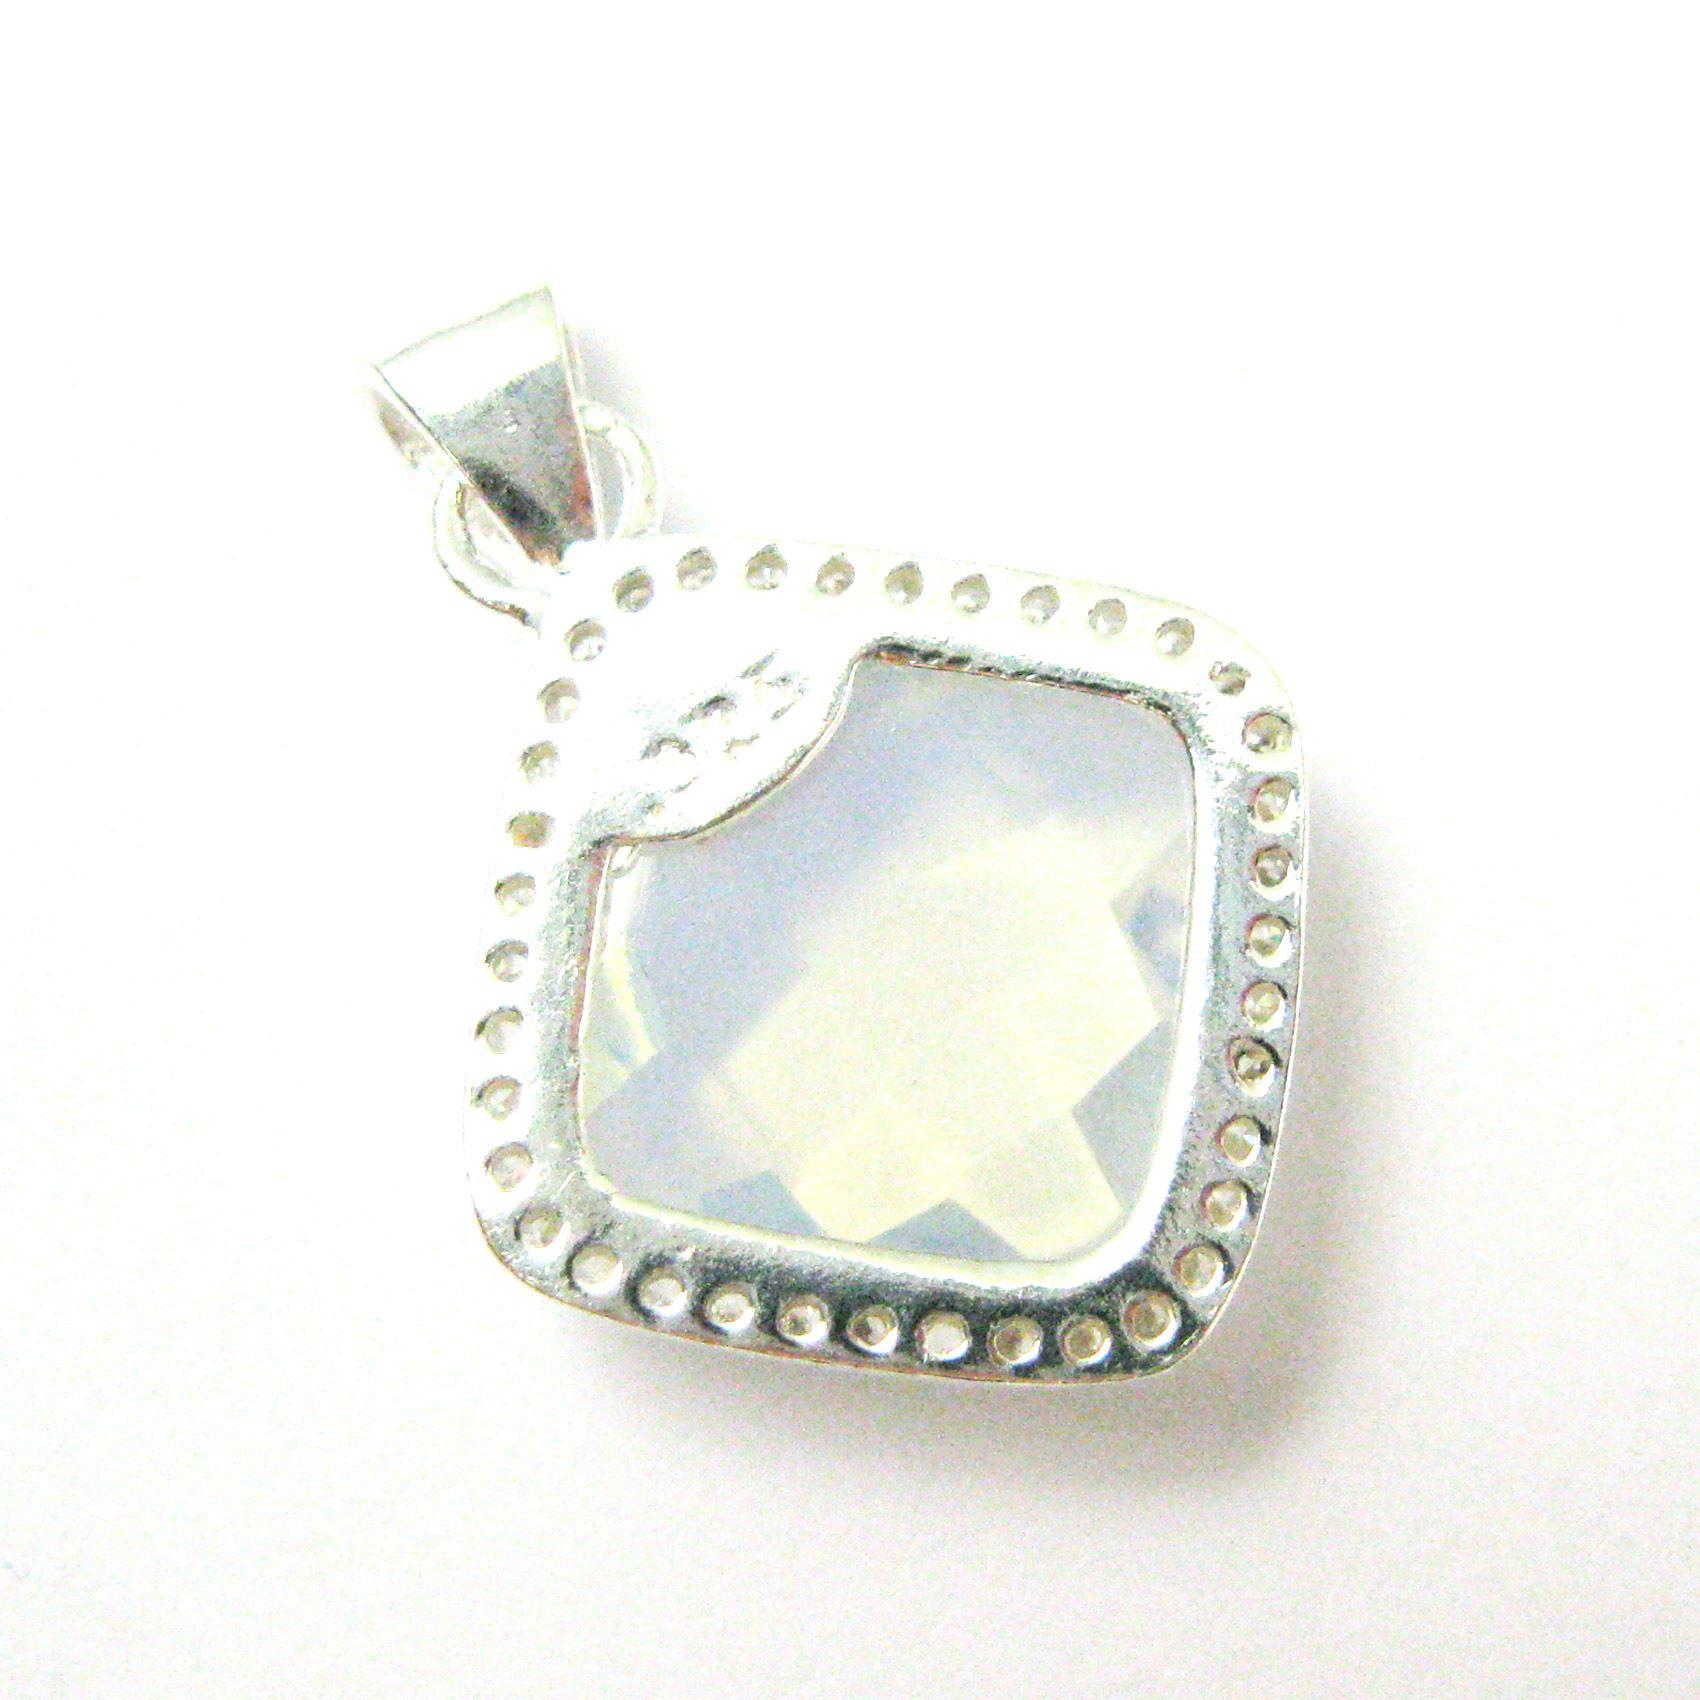 Sterling Silver Pave Bezel Gemstone Pendant - Cubic Zirconia Pave Setting -  Diamond Shape Faceted Stone-Opalite Quartz- 17mm